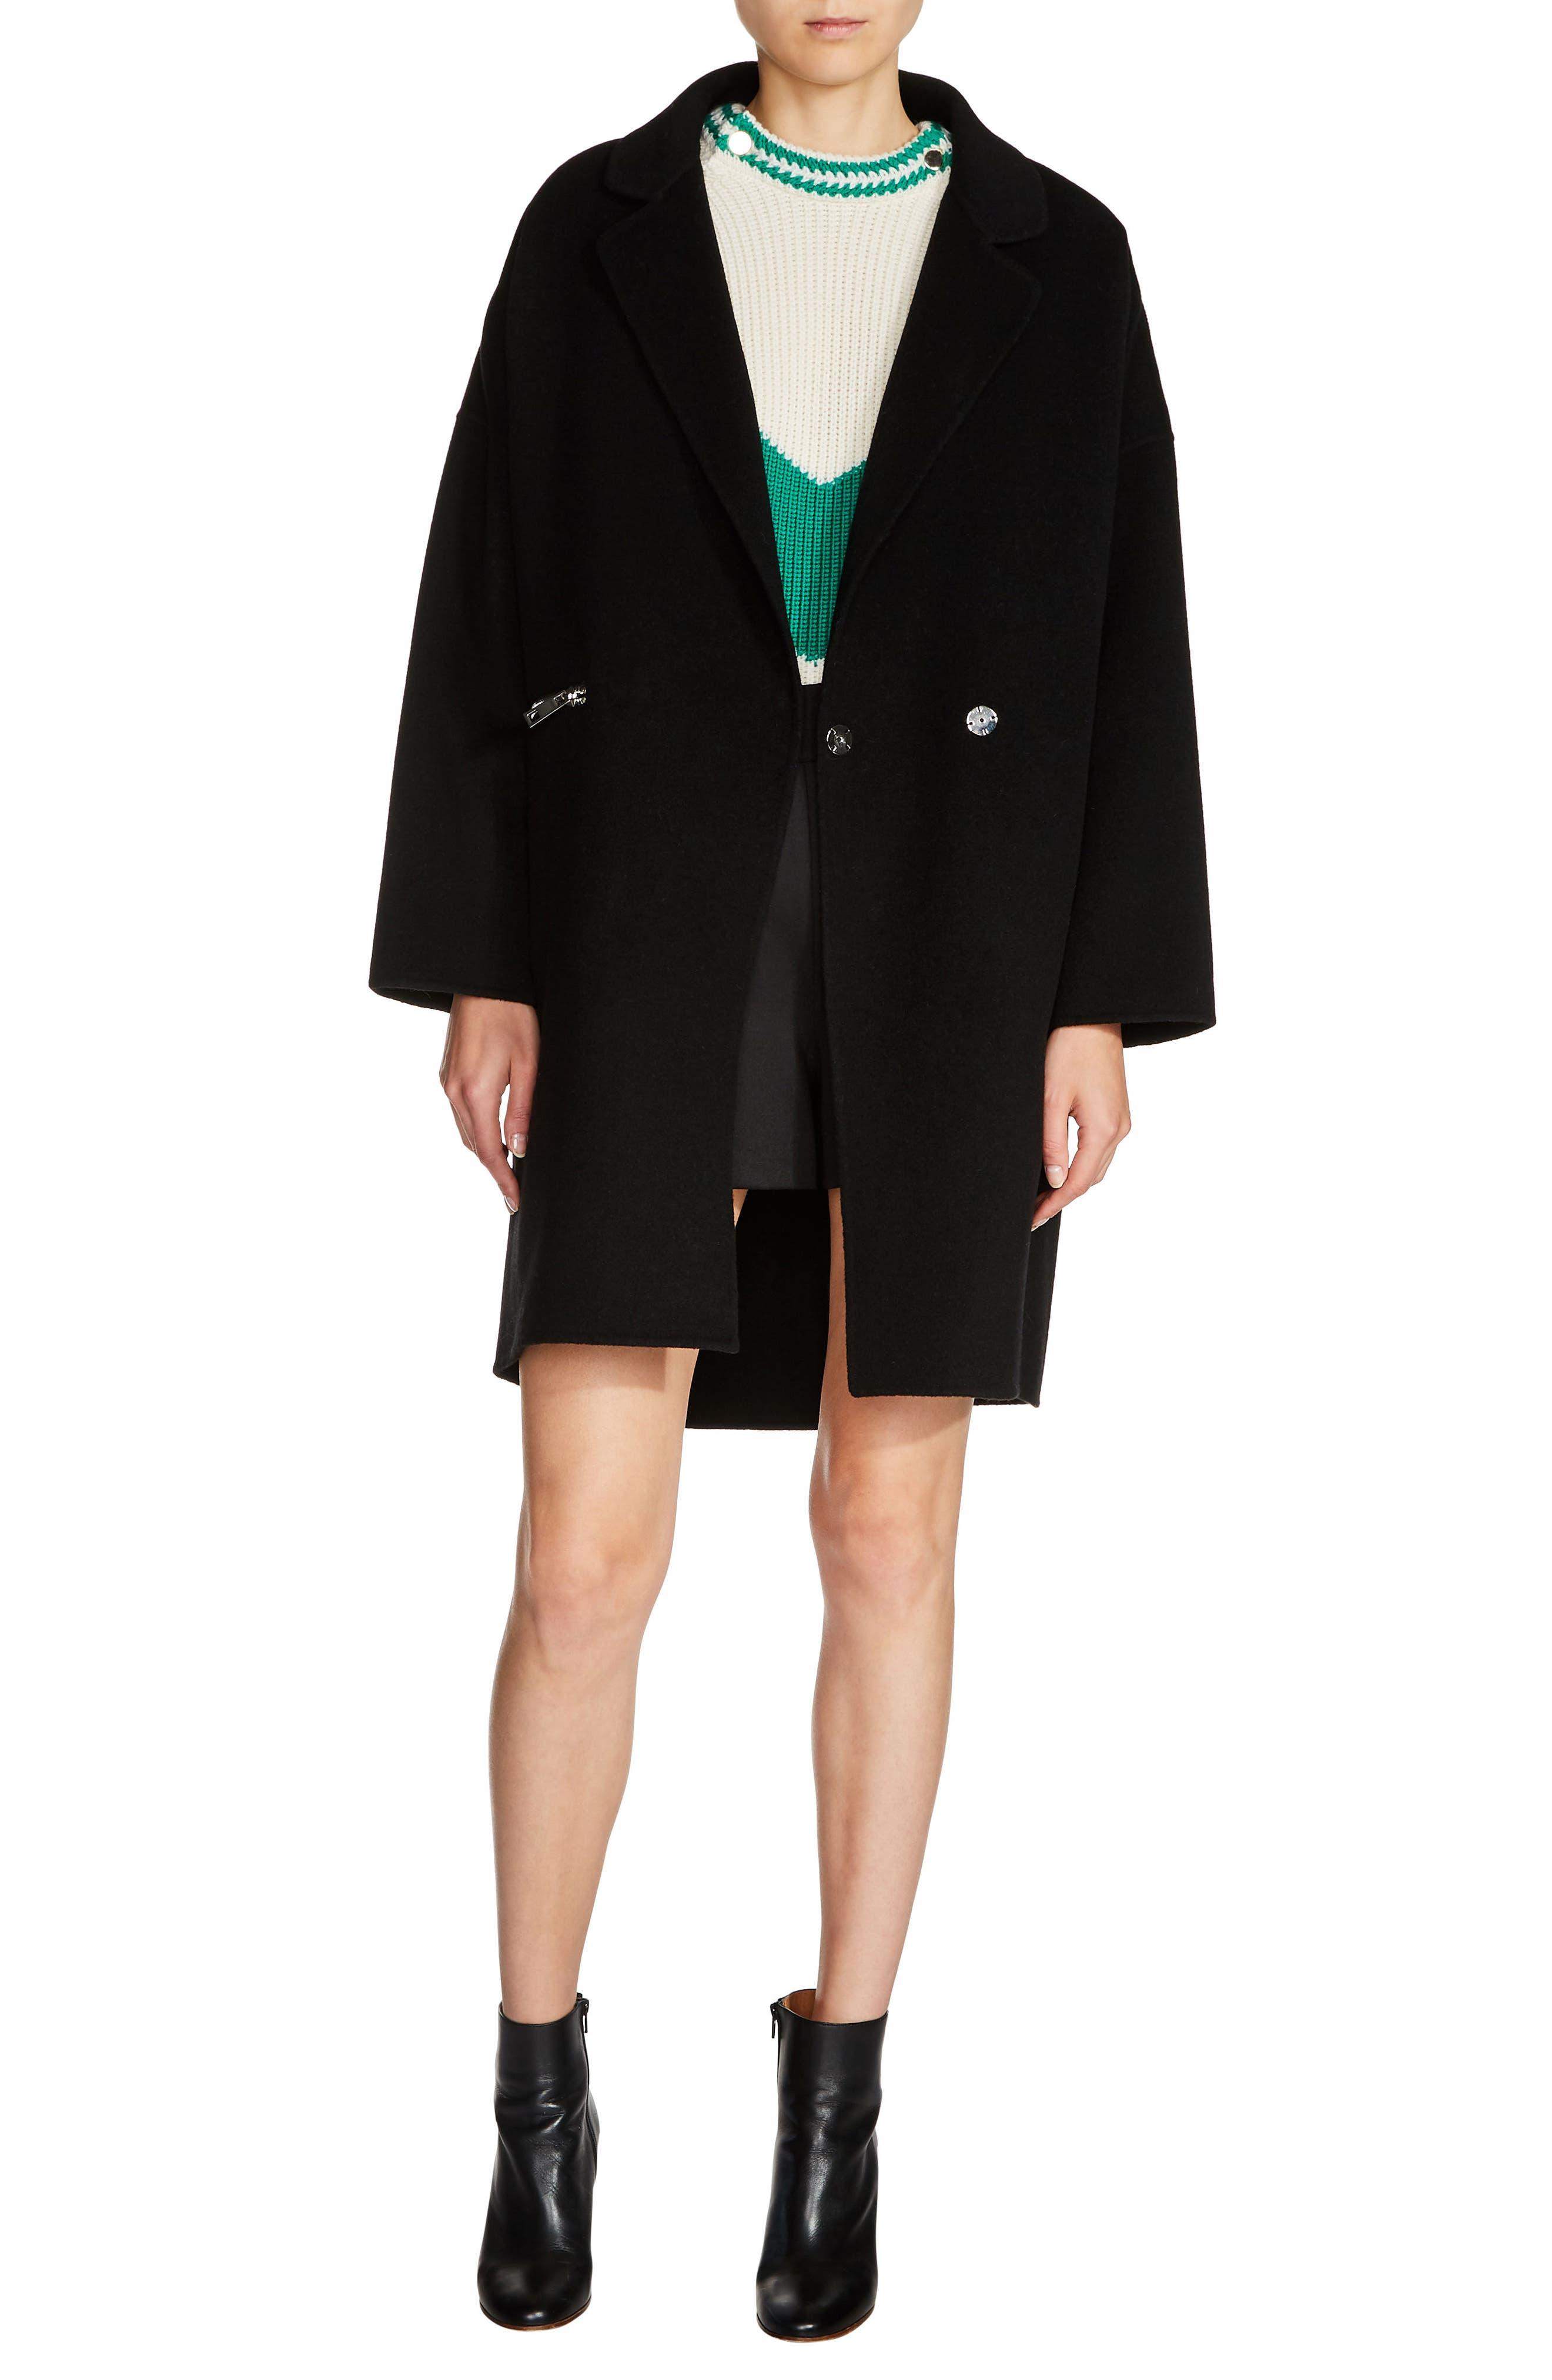 Alternate Image 1 Selected - maje Zip Pocket Double-Face Coat